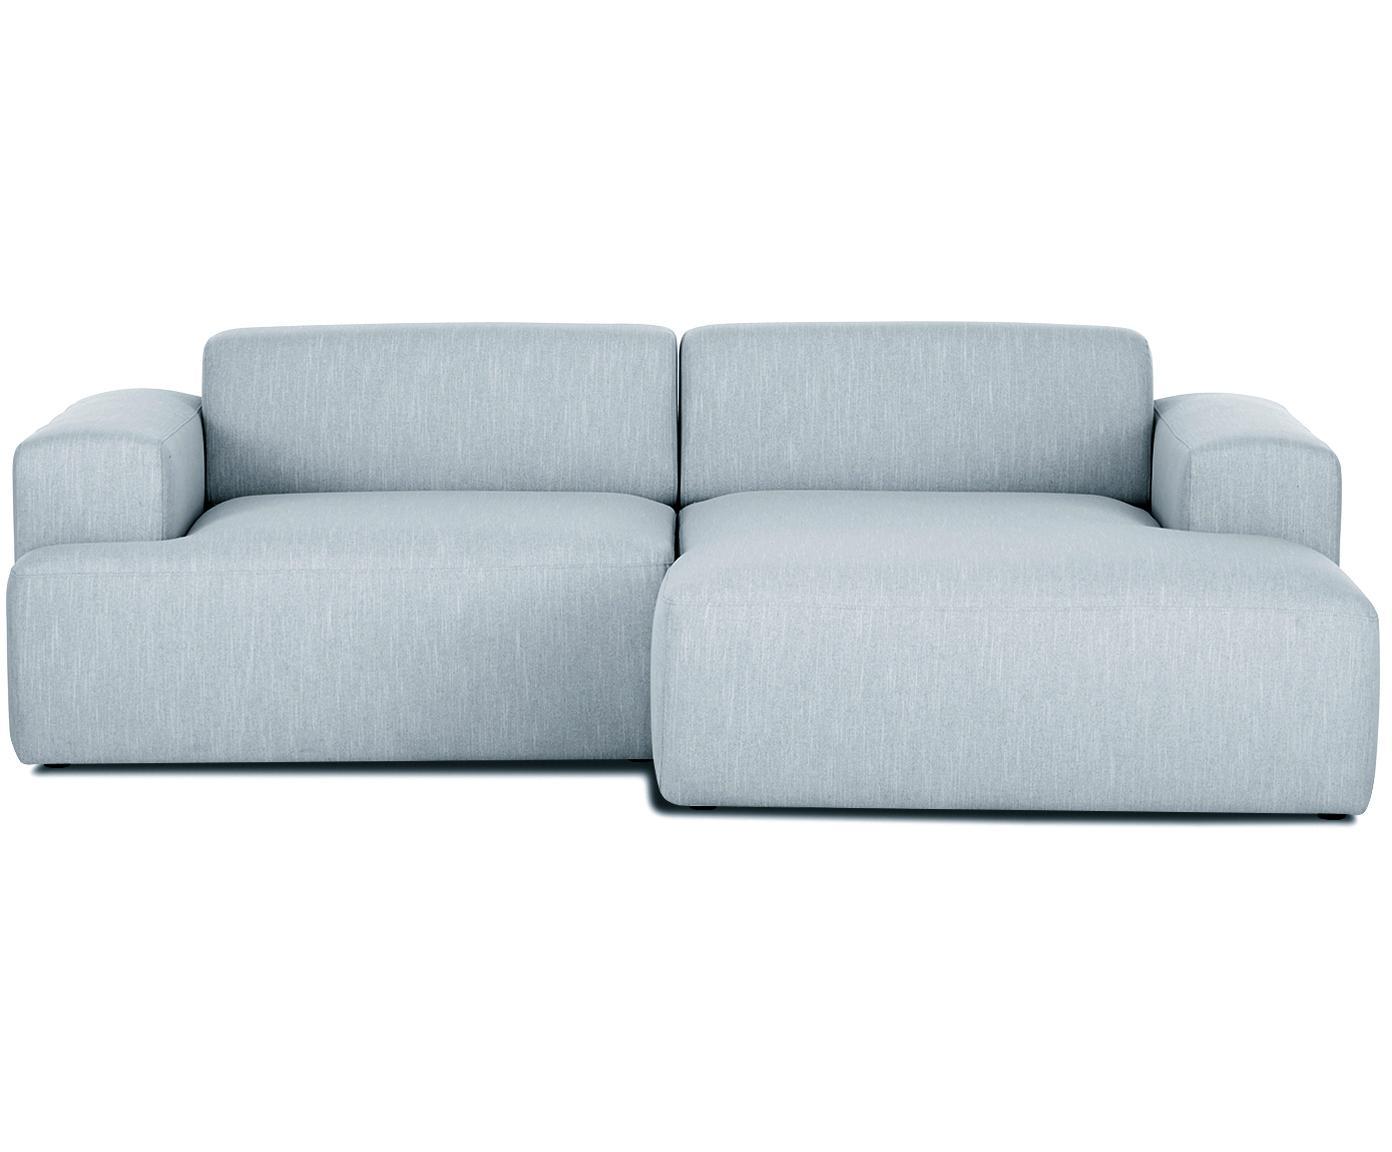 Ecksofa Melva (3-Sitzer), Bezug: Polyester 35.000 Scheuert, Gestell: Massives Kiefernholz, Spa, Webstoff Blaugrau, B 240 x T 144 cm